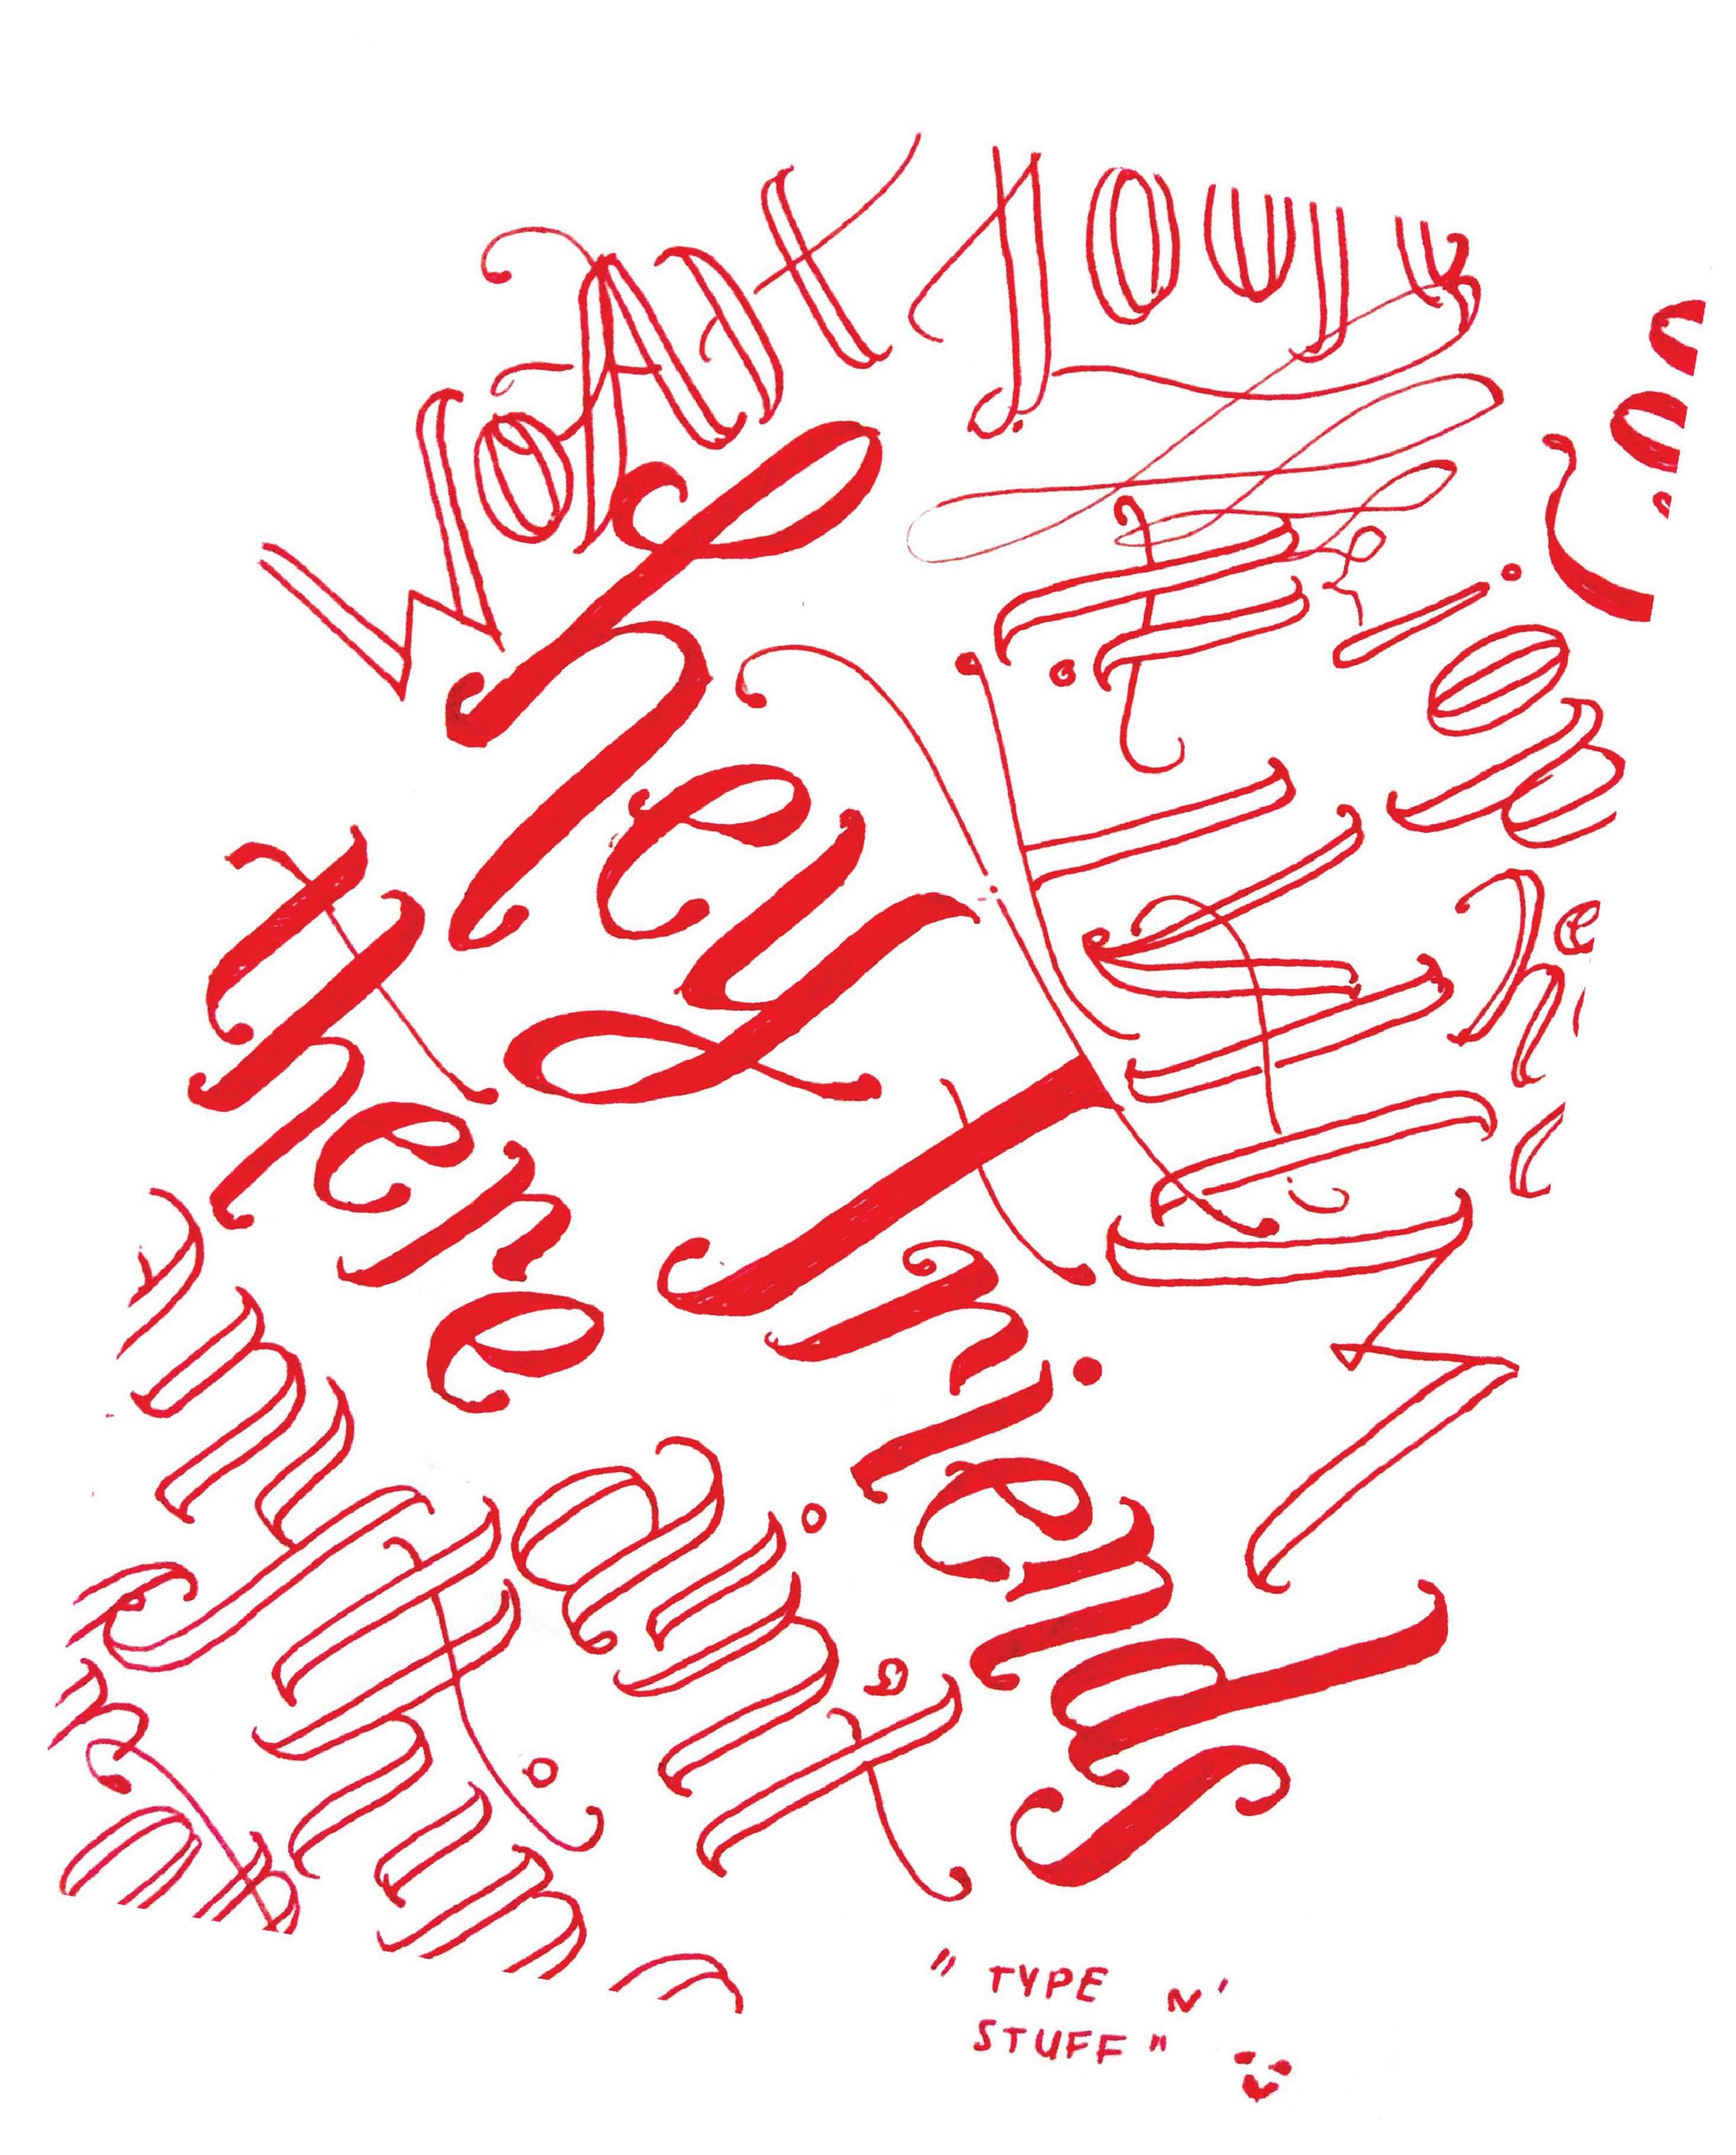 Gel Pen Scribbling